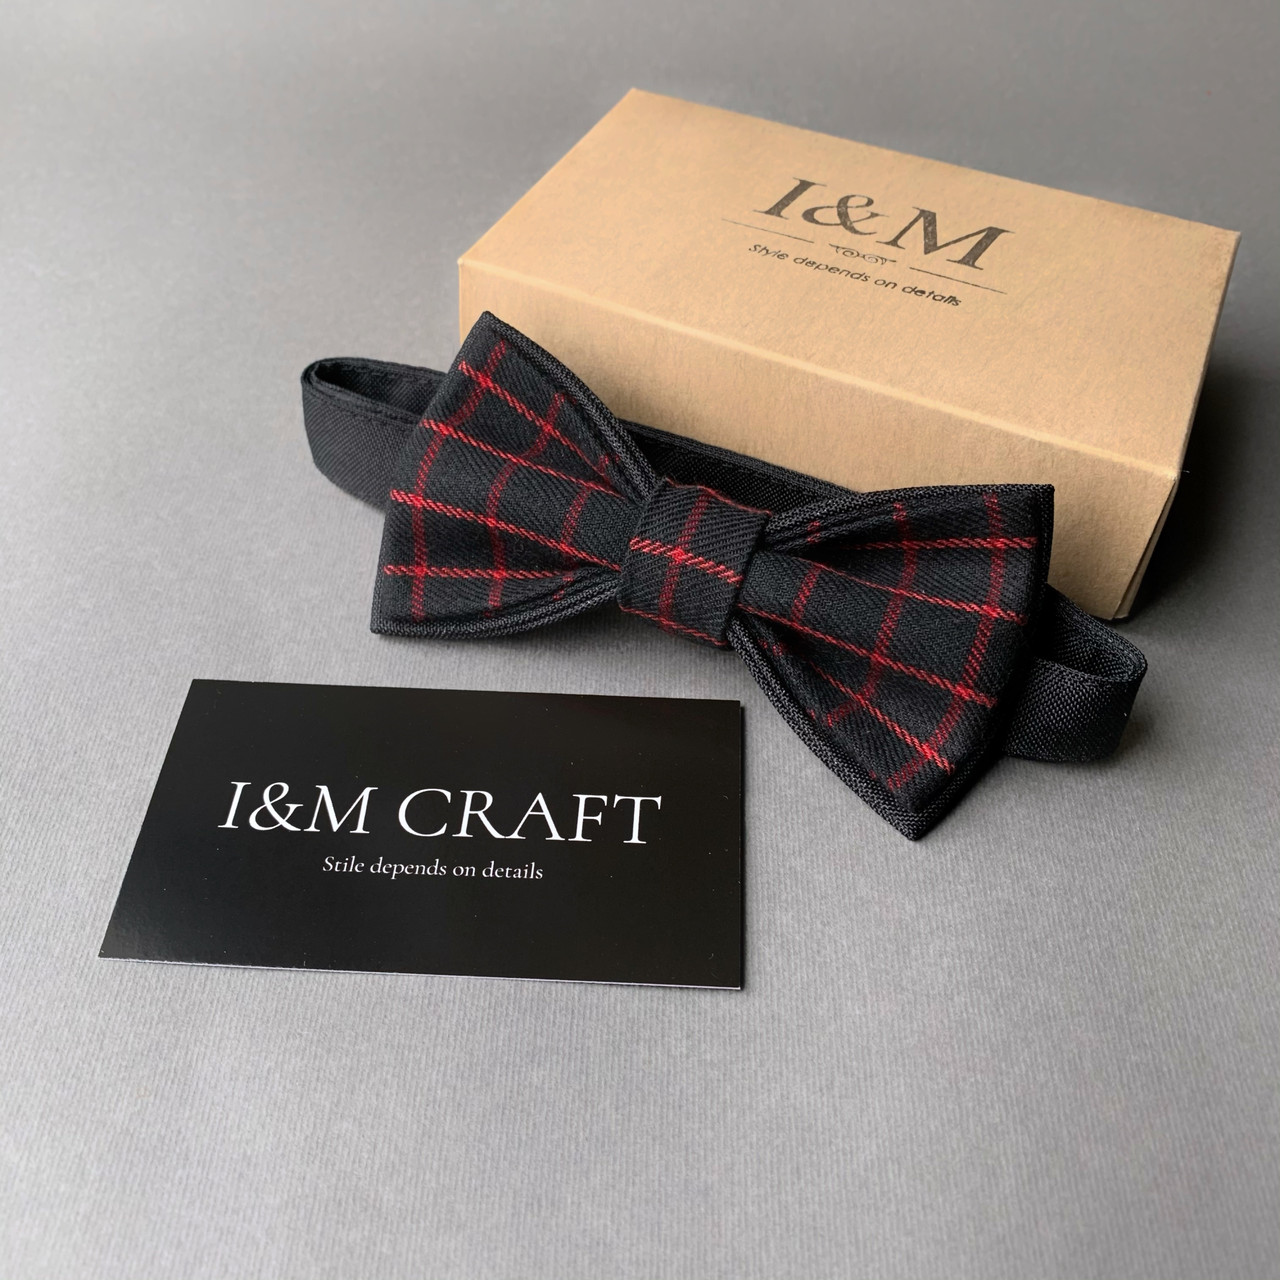 Краватка-метелик I&M Craft чорний в червону клітку (010431)